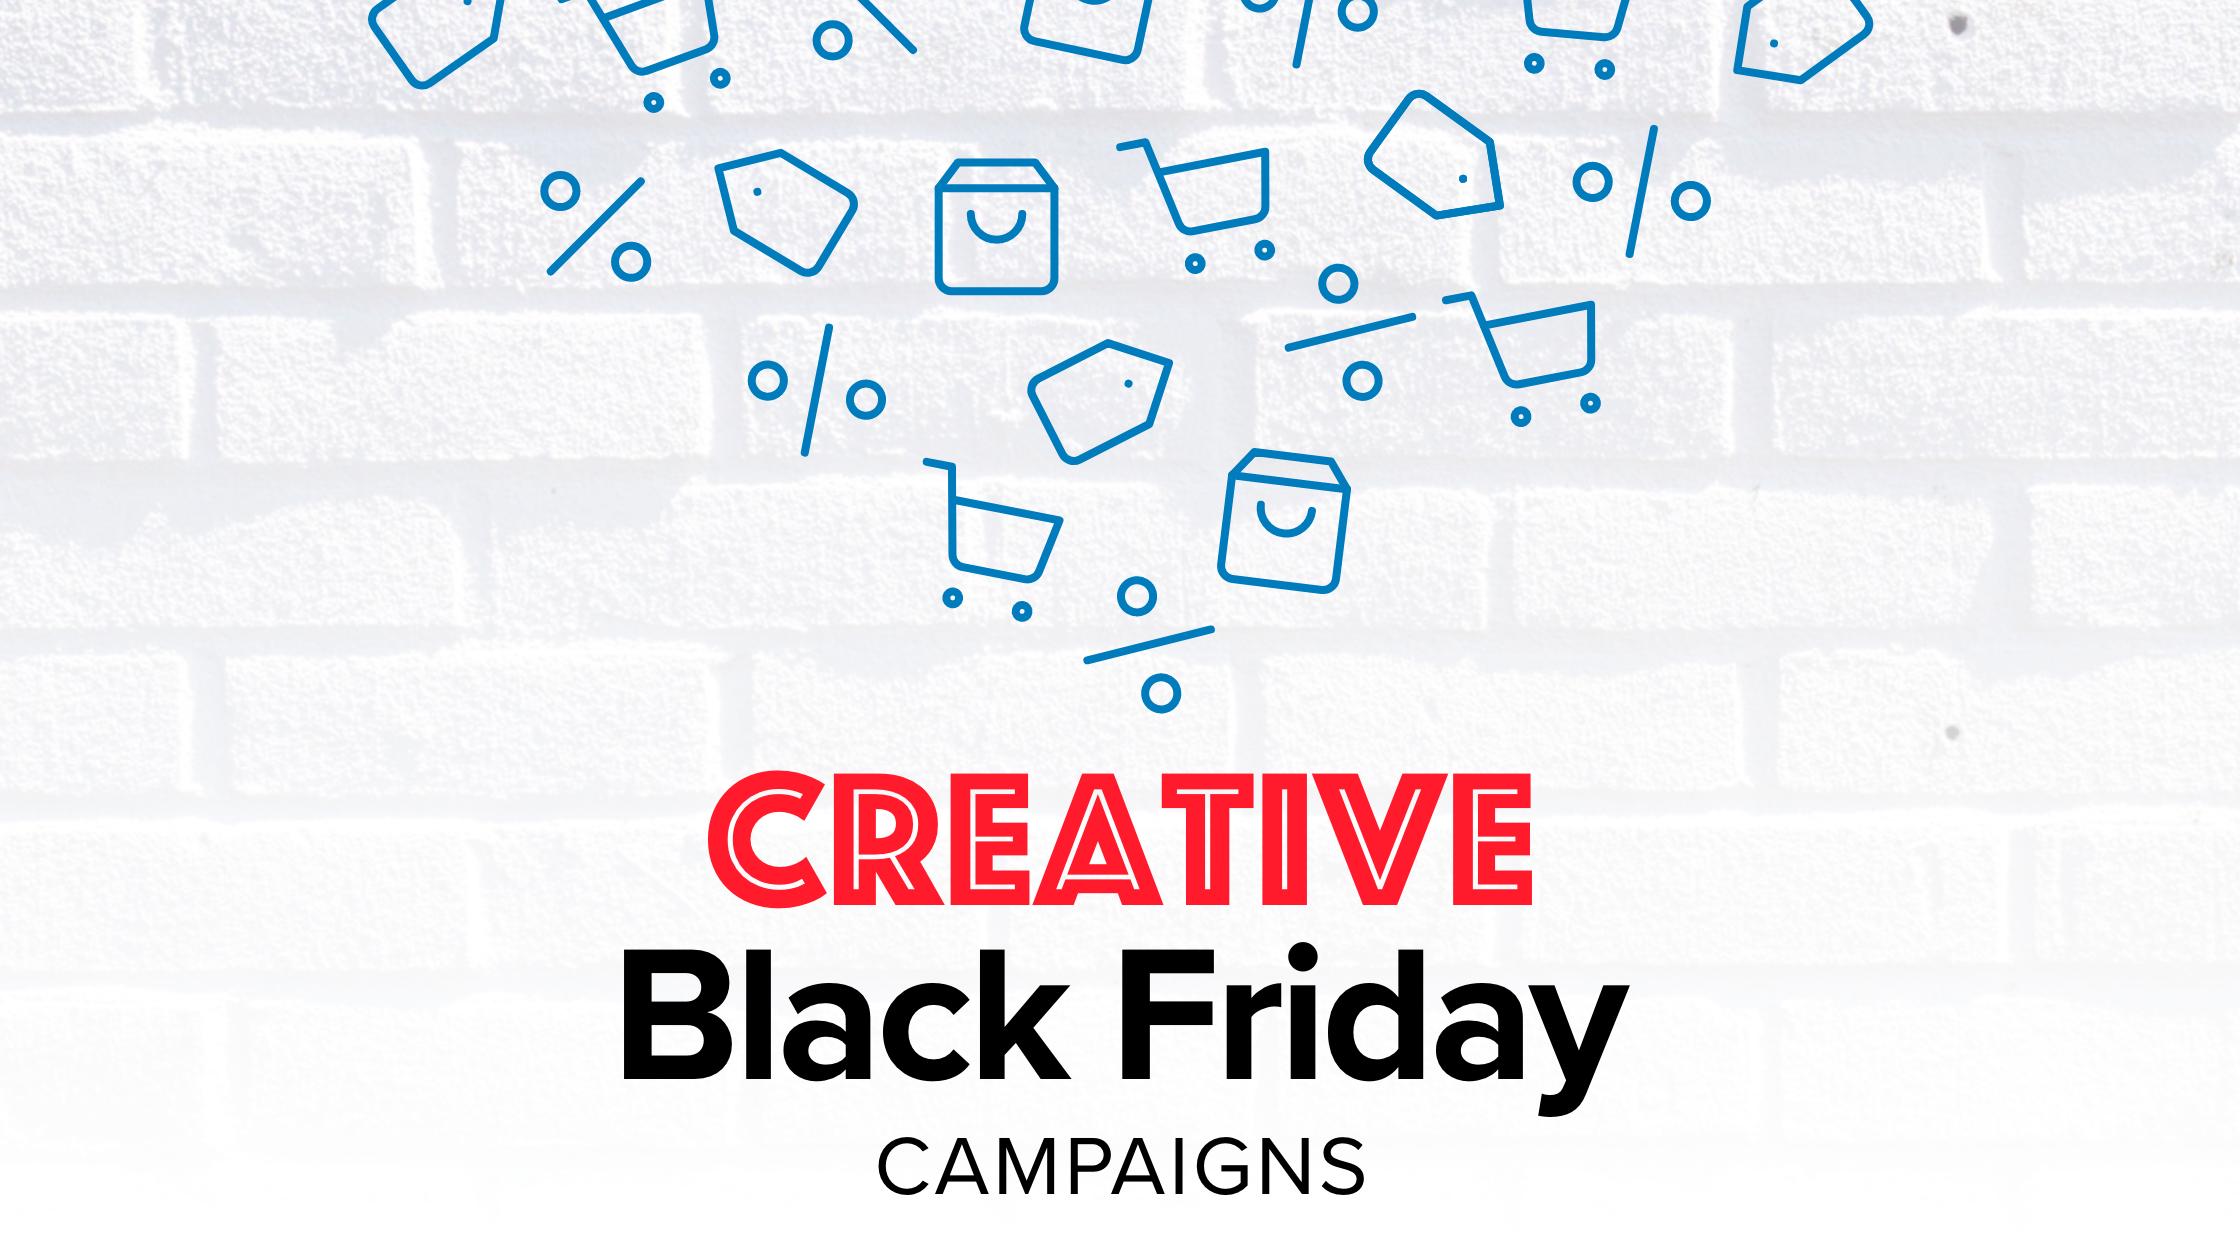 Creative Black Friday Campaigns